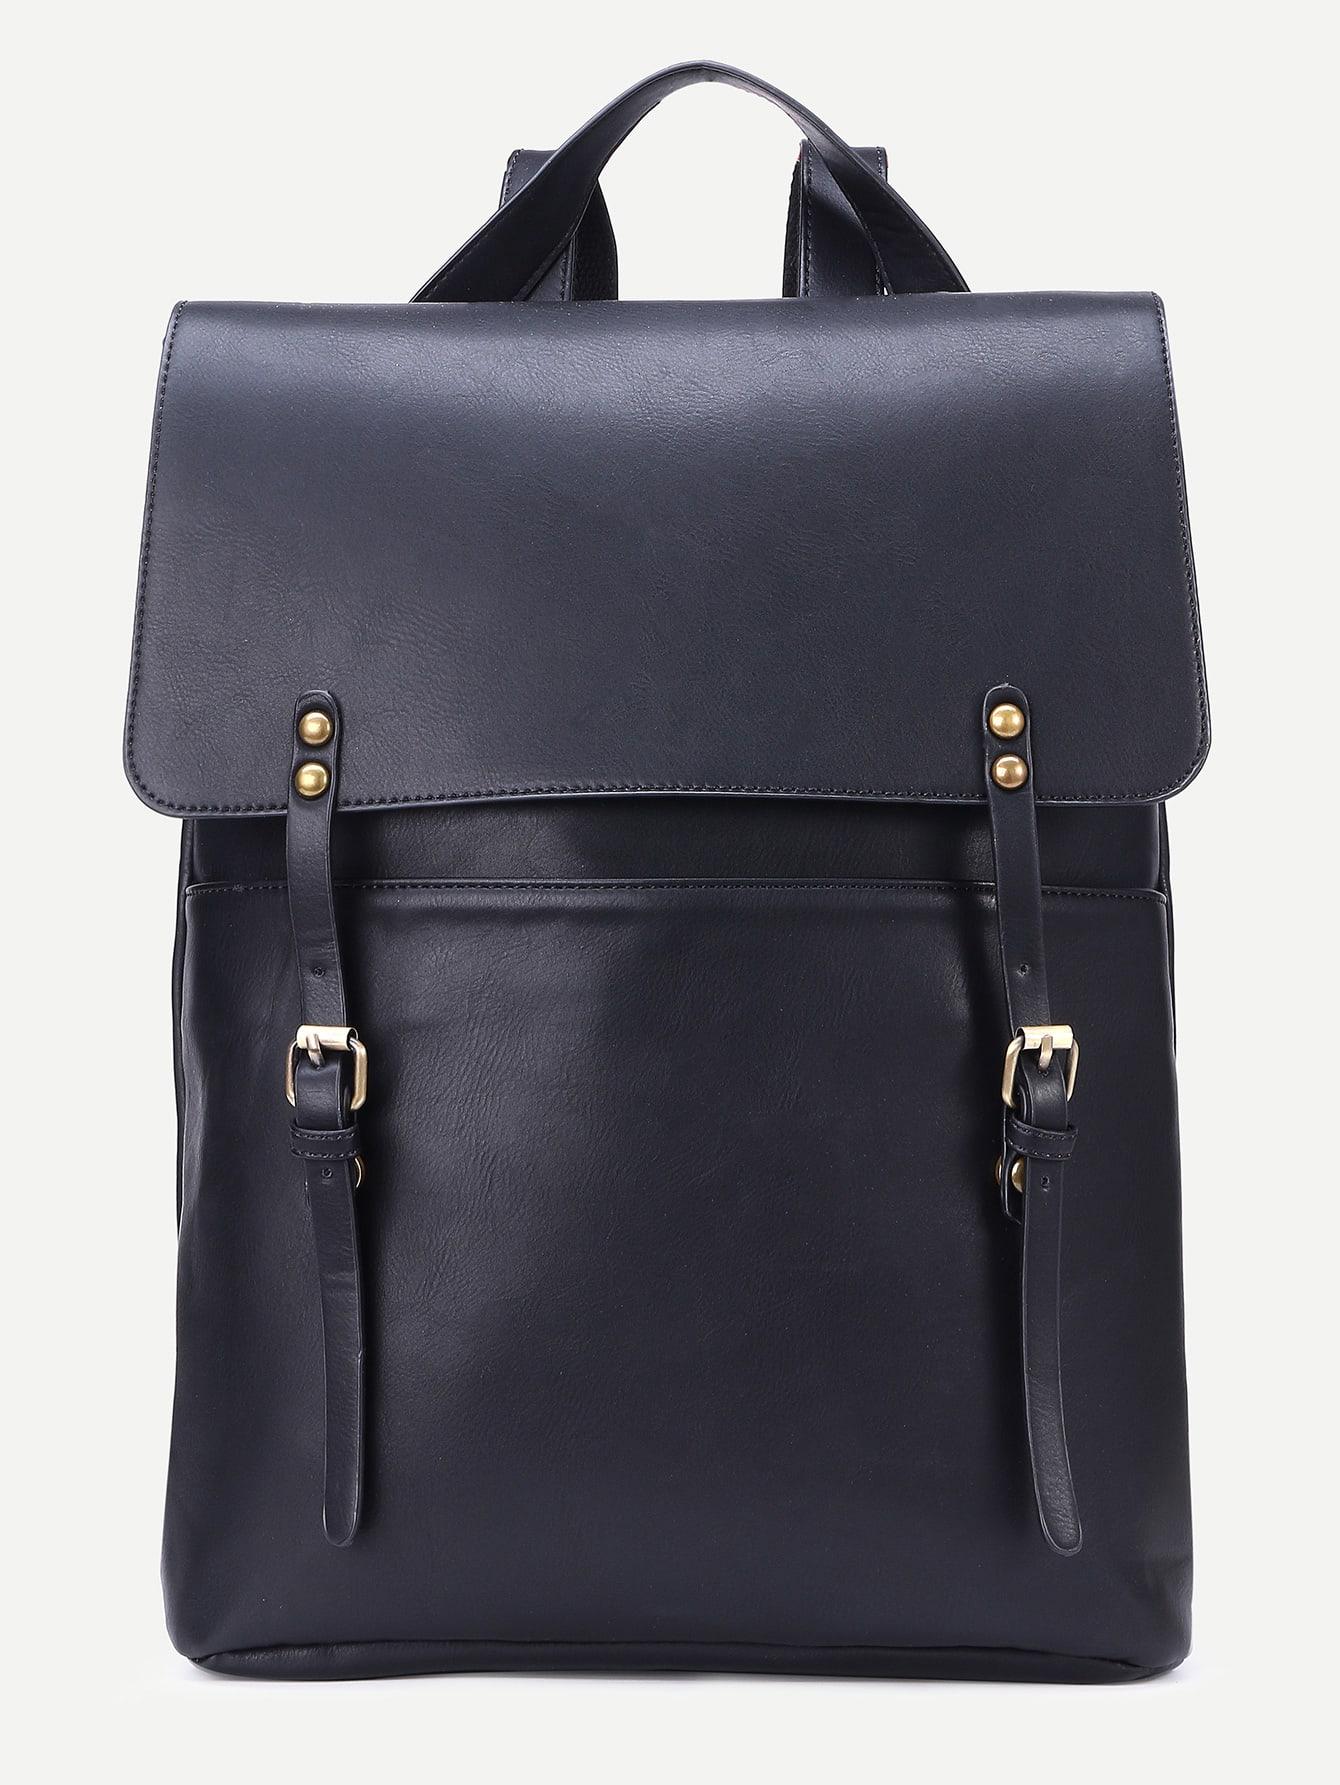 bag160824914_2